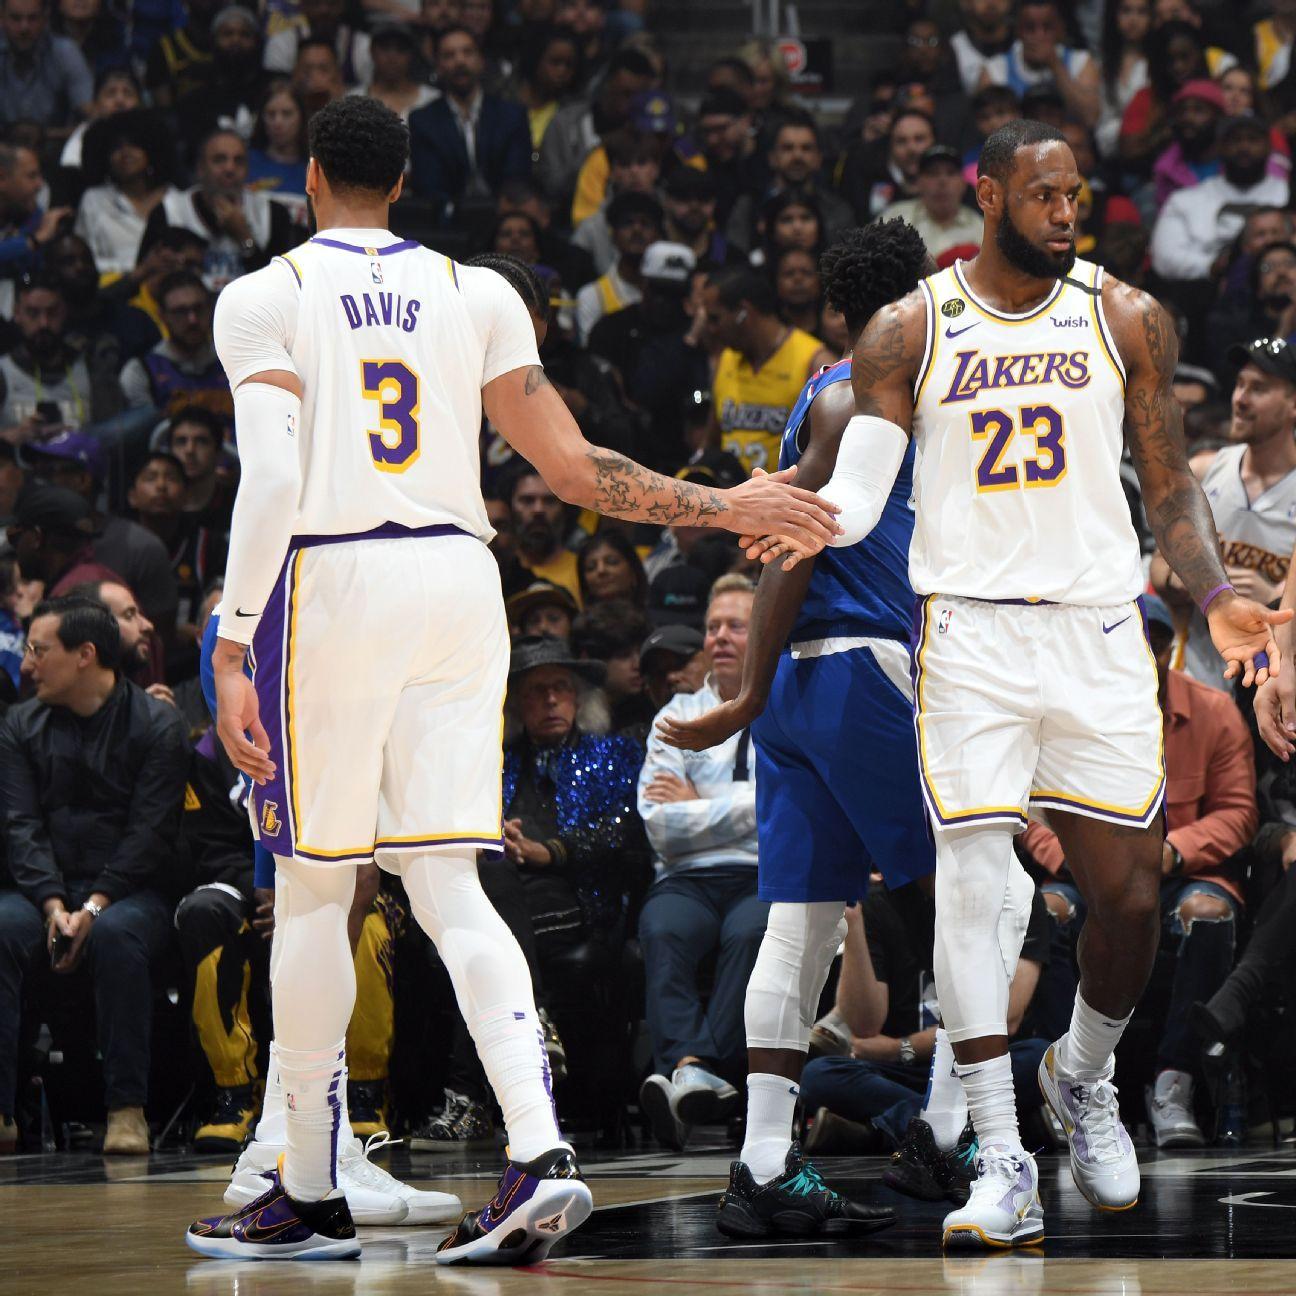 Davis: Lakers' title chances higher after long rest